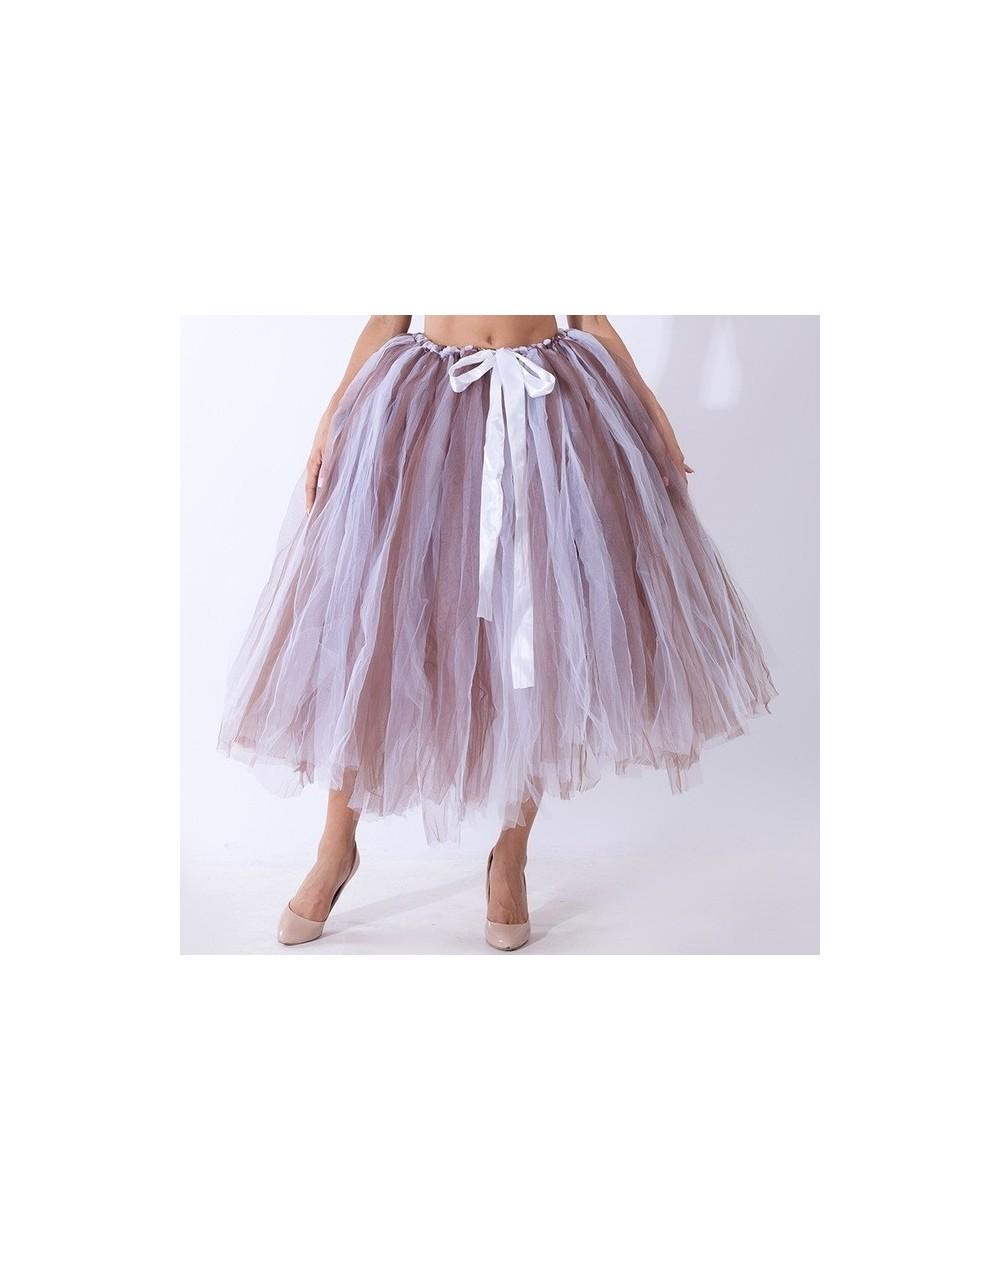 Handmade 80CM Midi Tulle Tutu Skirts for Women High Quality Ball Gown Skirt Party Props Petticoat 2019 Faldas Saia Jupe - co...